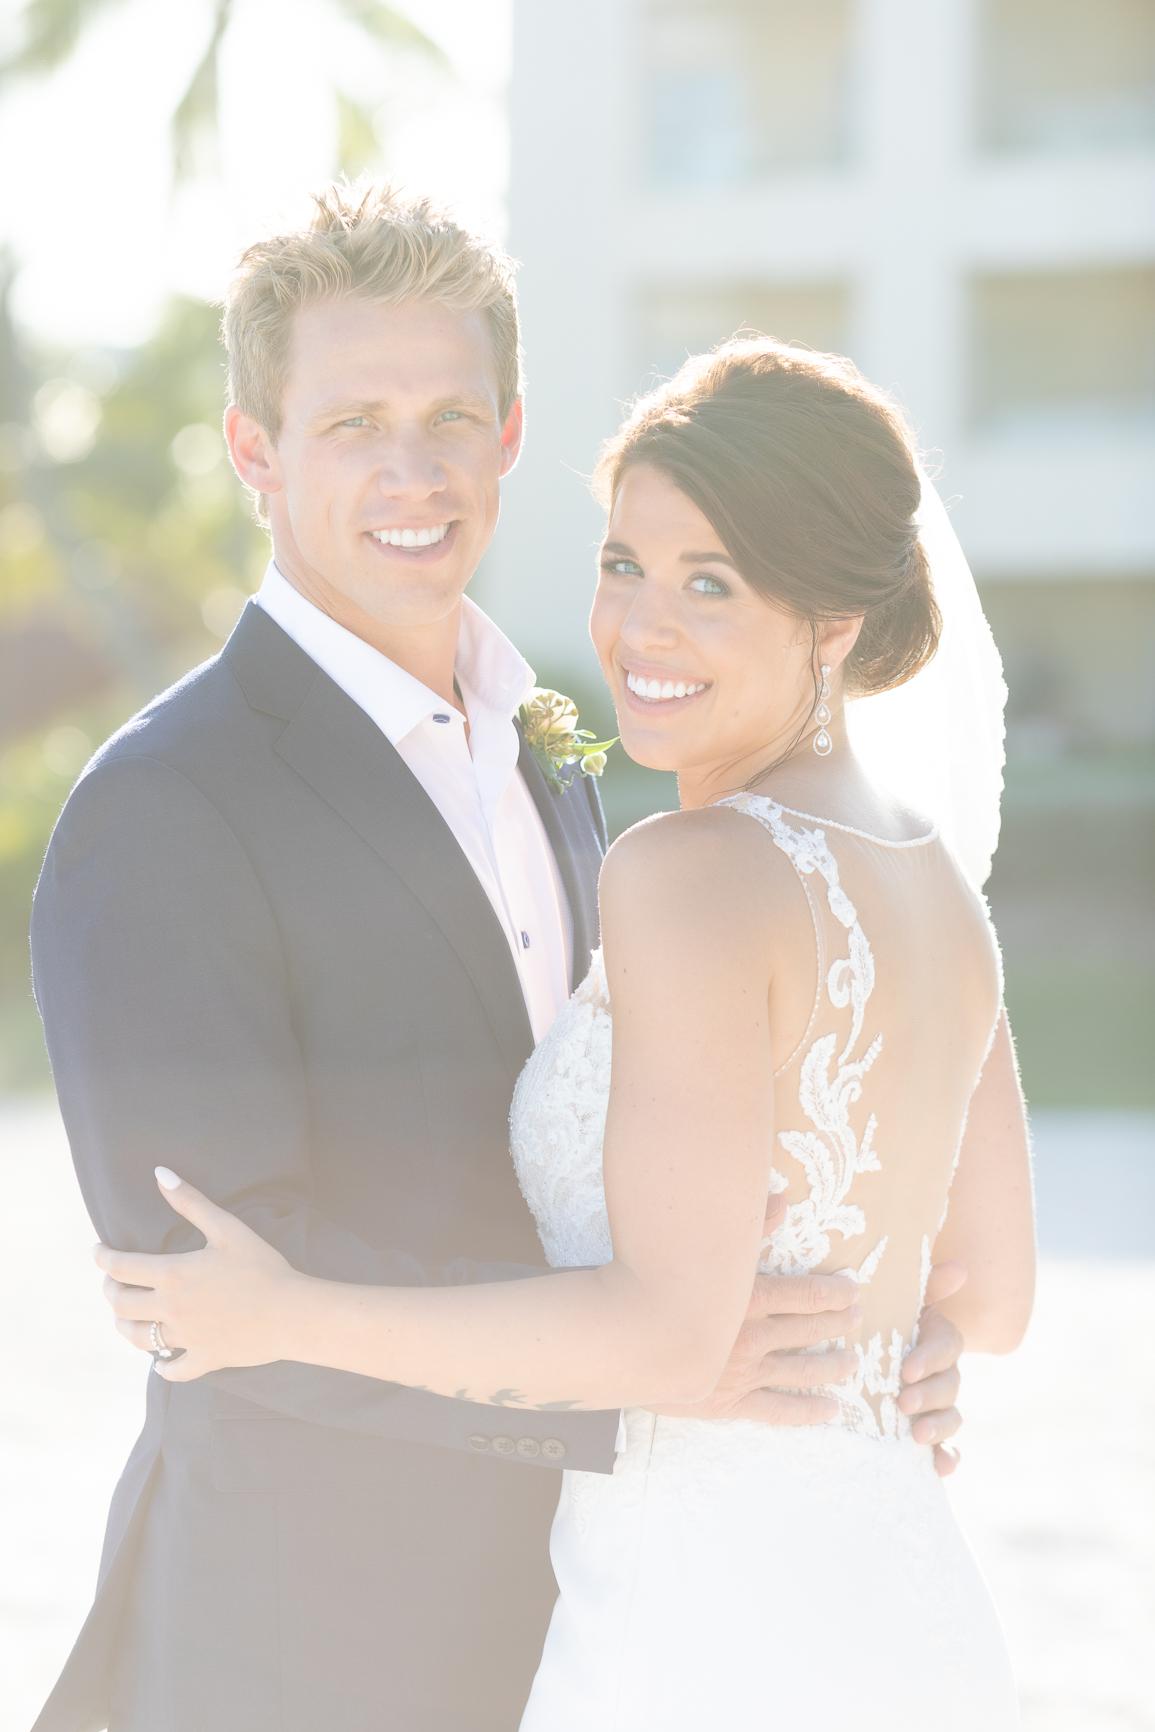 Key West Wedding Casa Marina - Key West Wedding Photographer